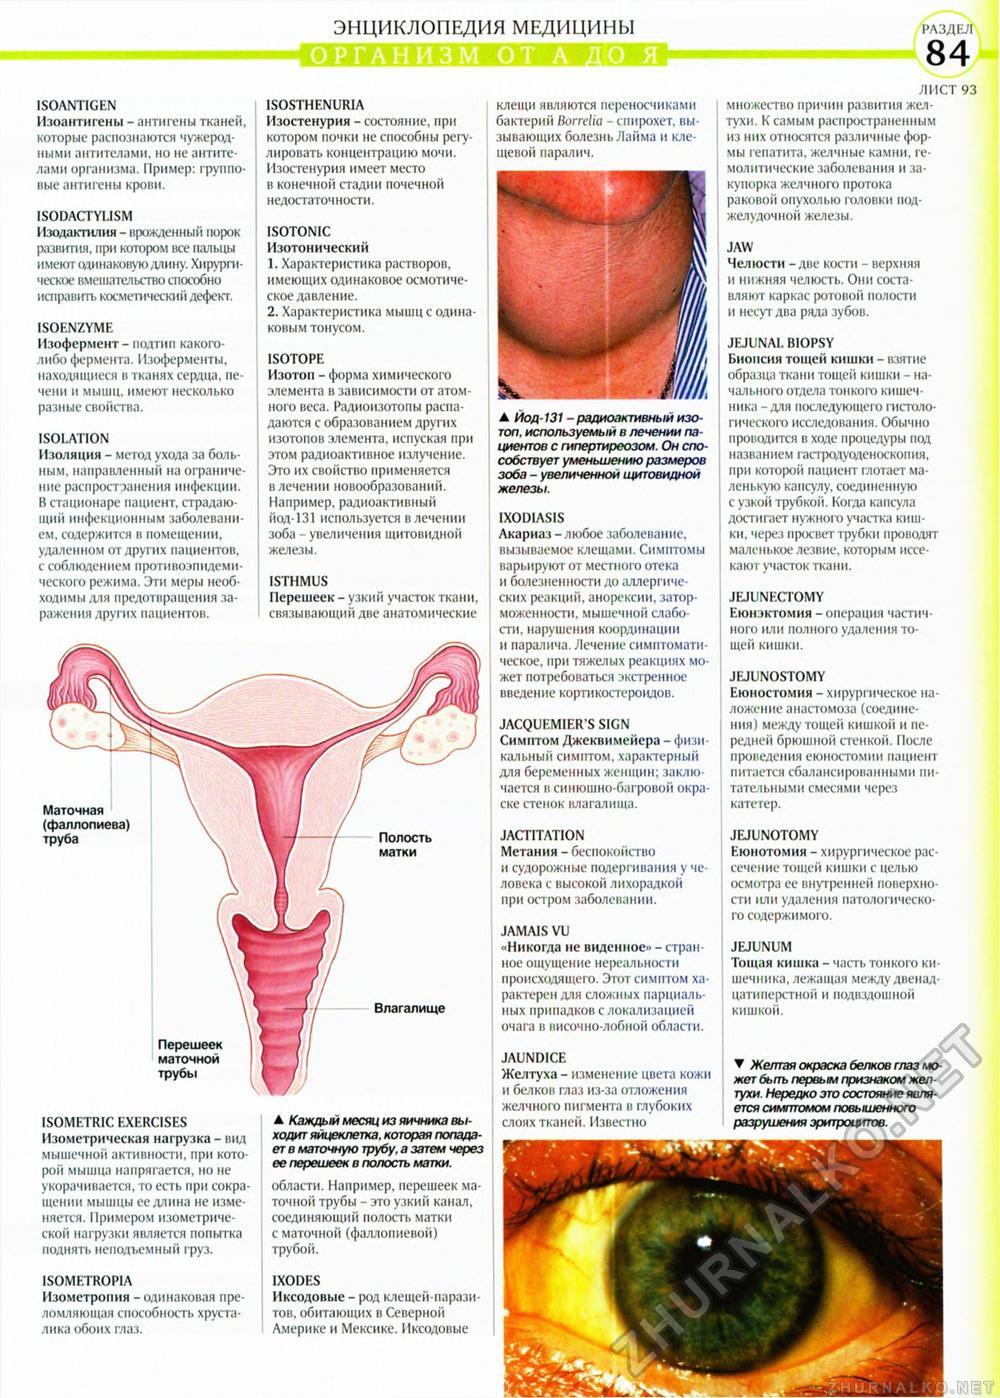 Еюнэктомия фото